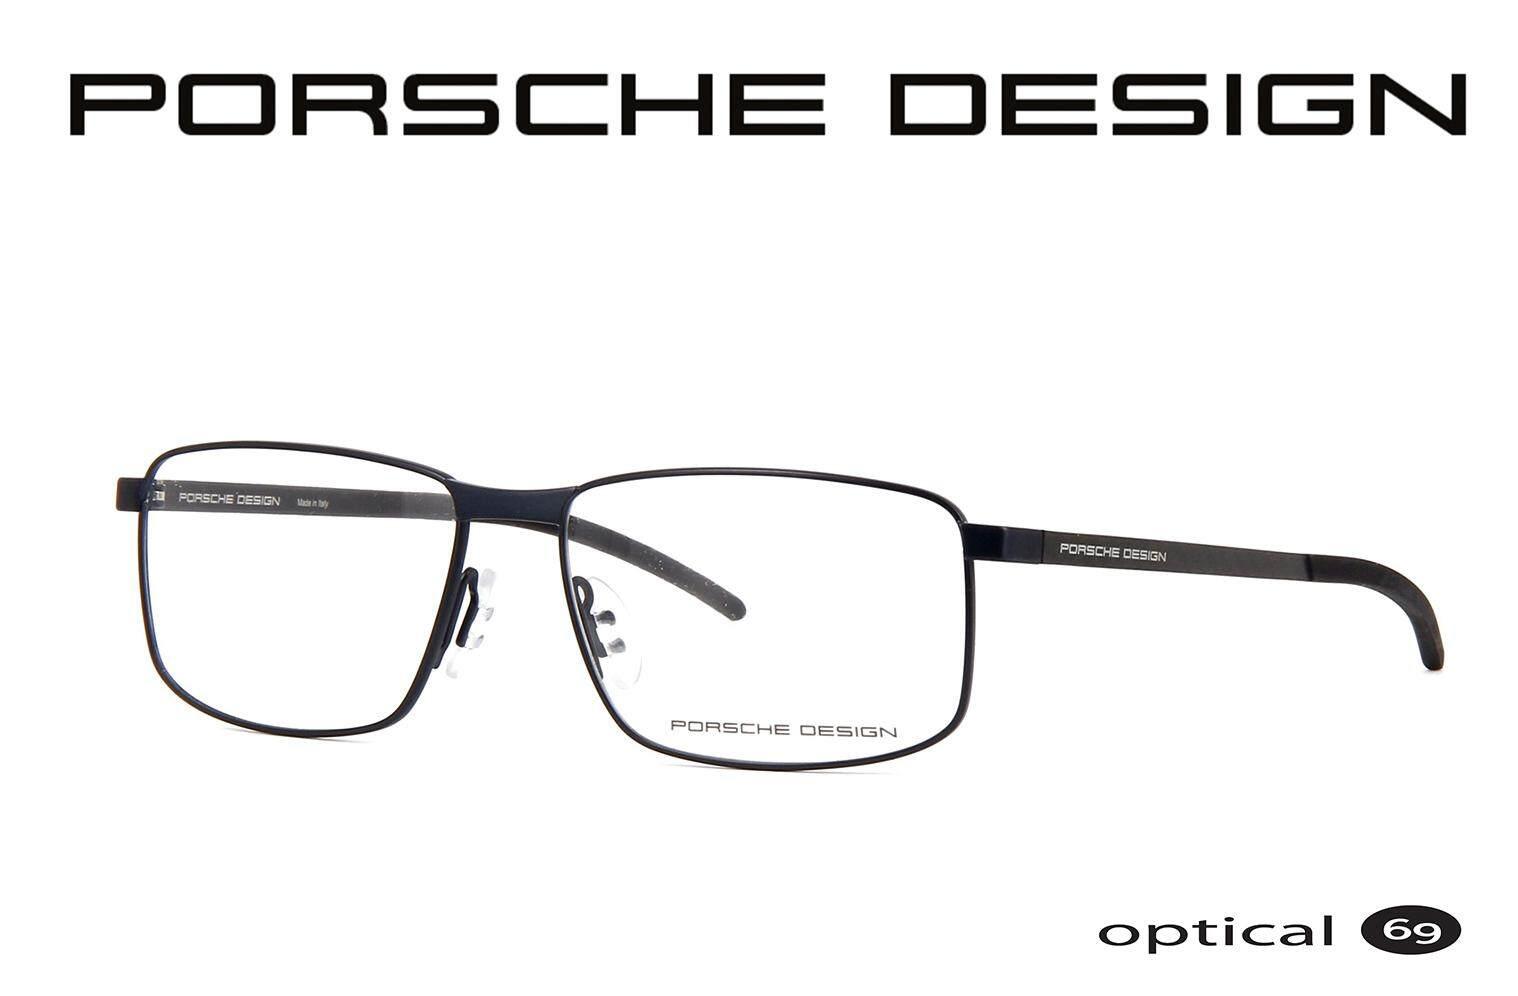 cbc098d33d Porsche Design P8340 Black Carbon Fiber Malaysia eyewear optical frame Italy  Branded eyeglasses prescription glasses